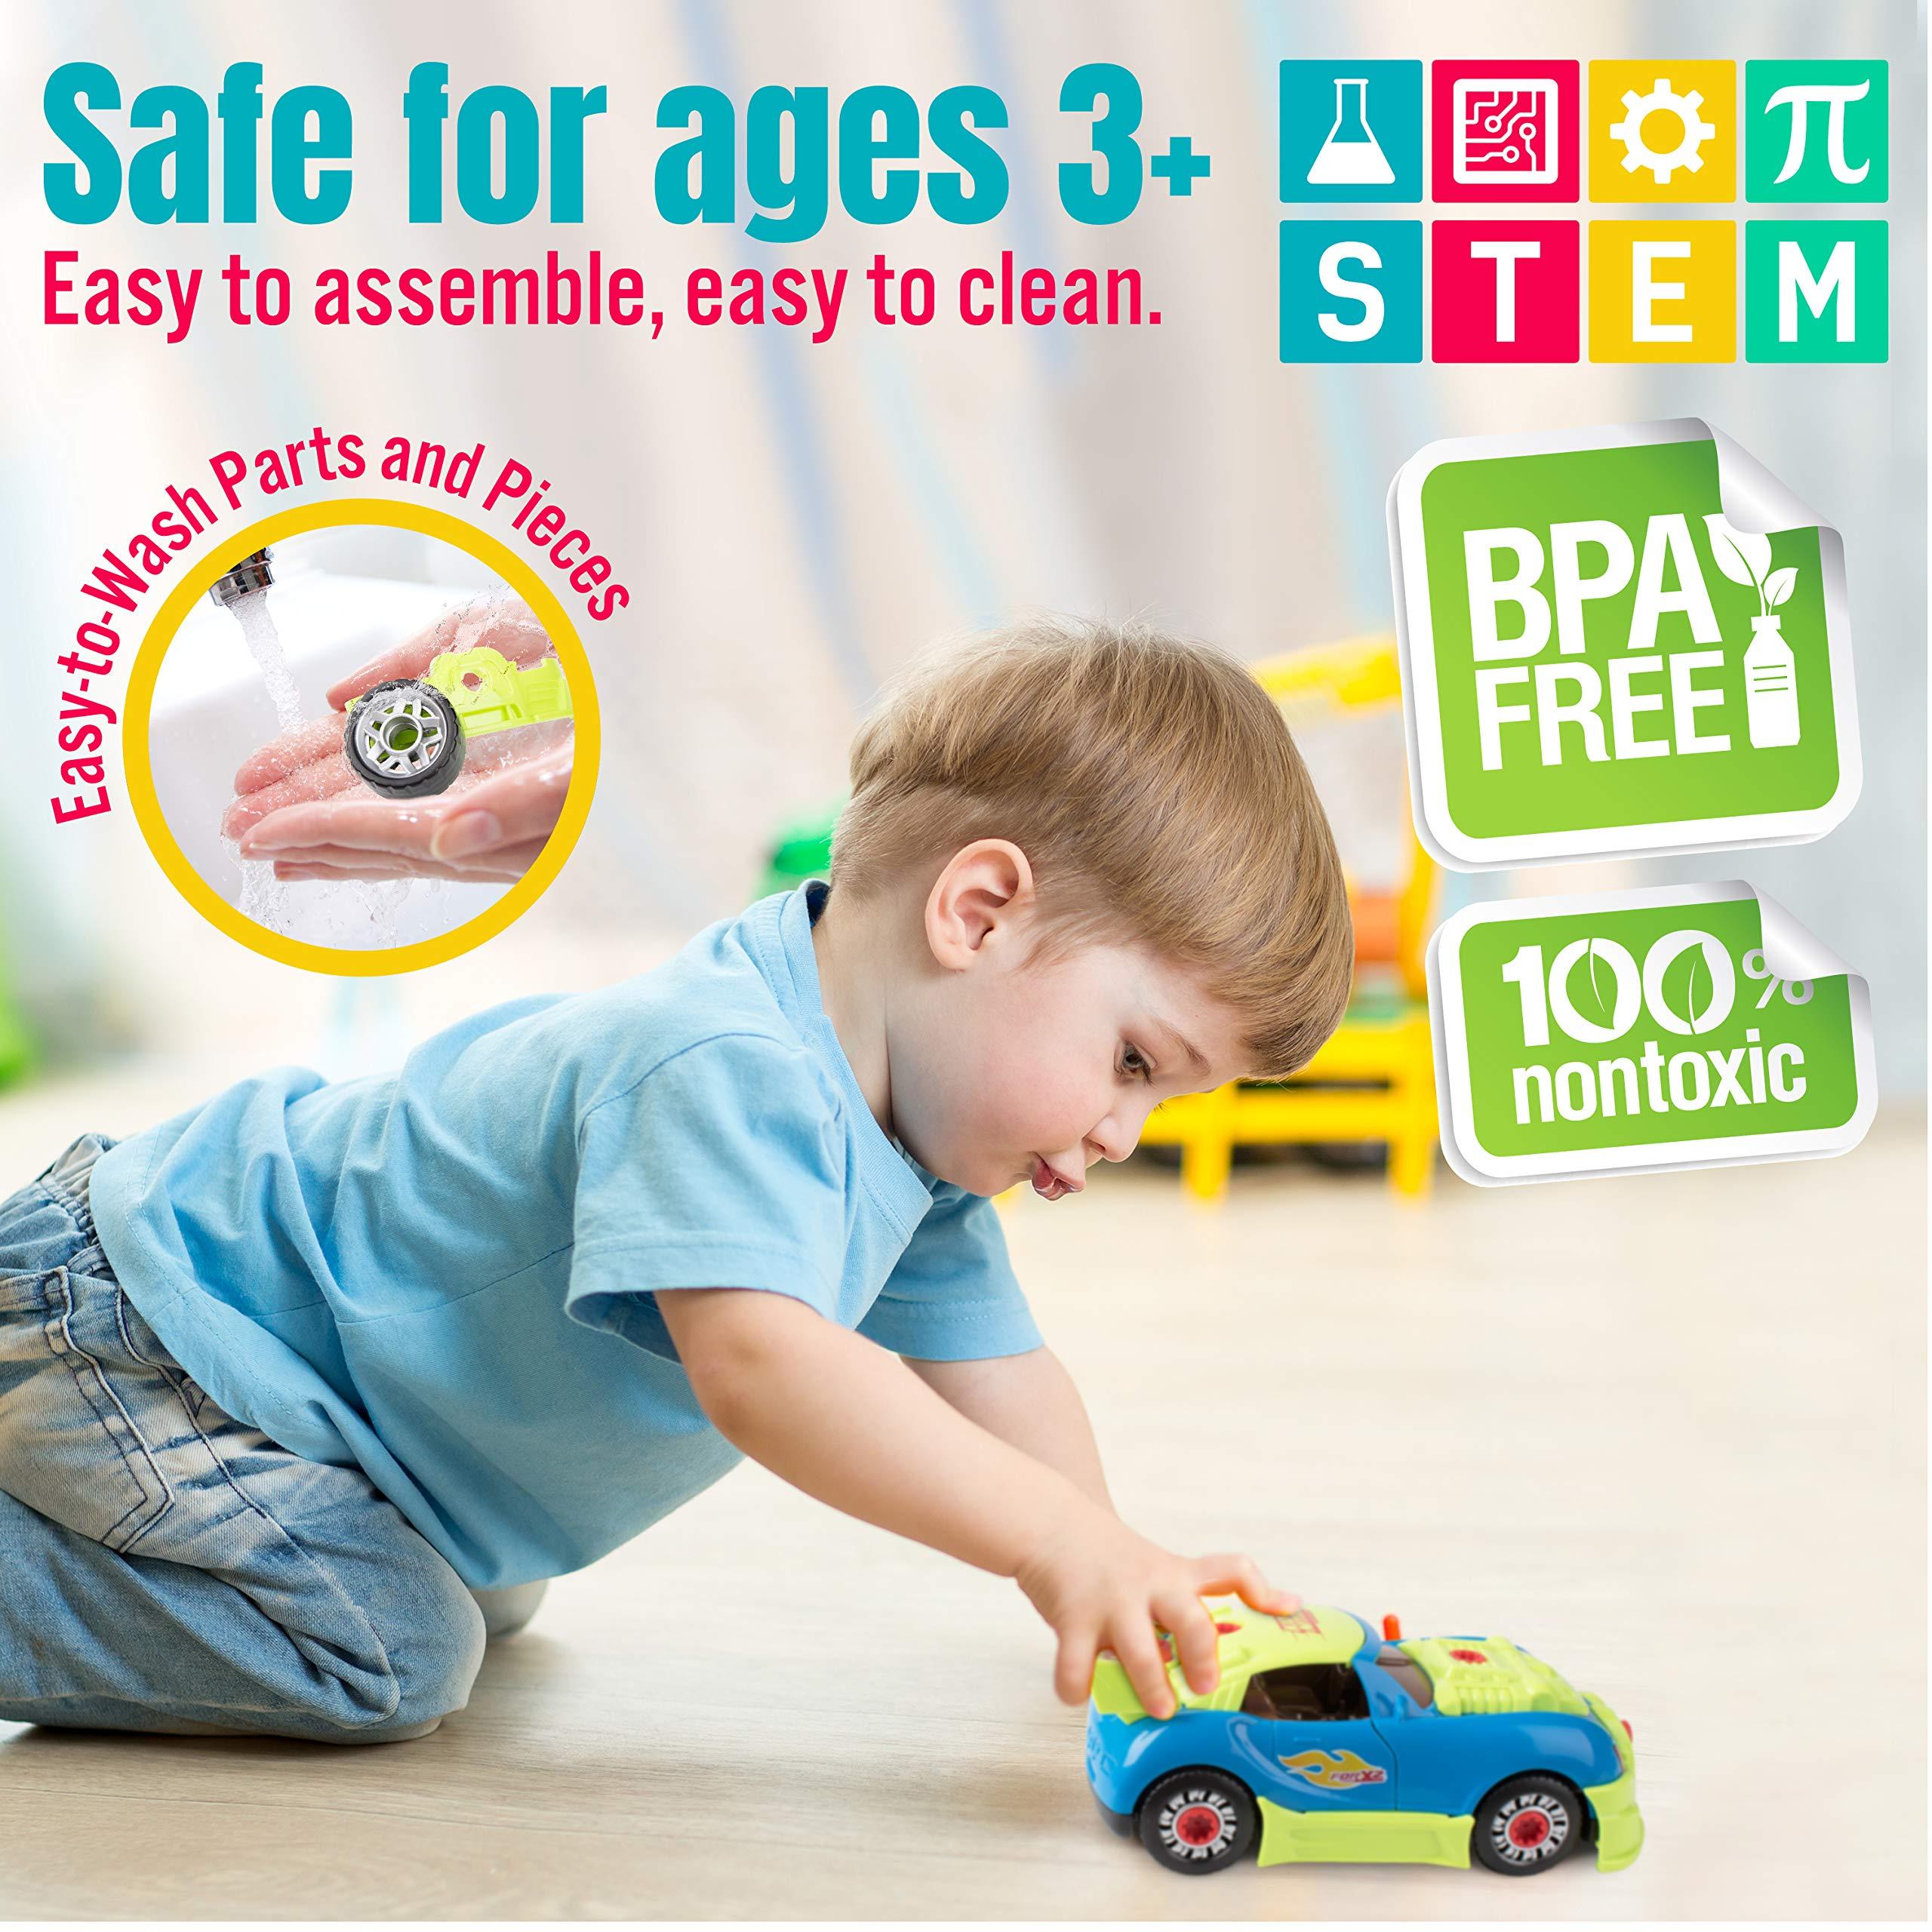 USA Toyz Race Car Take Apart Toys - 52pk Build a Car STEM Building Toys Set, Take Apart Car Building Kits for Kids w/ Car Drill Tool for Boys or Girls by USA Toyz (Image #5)